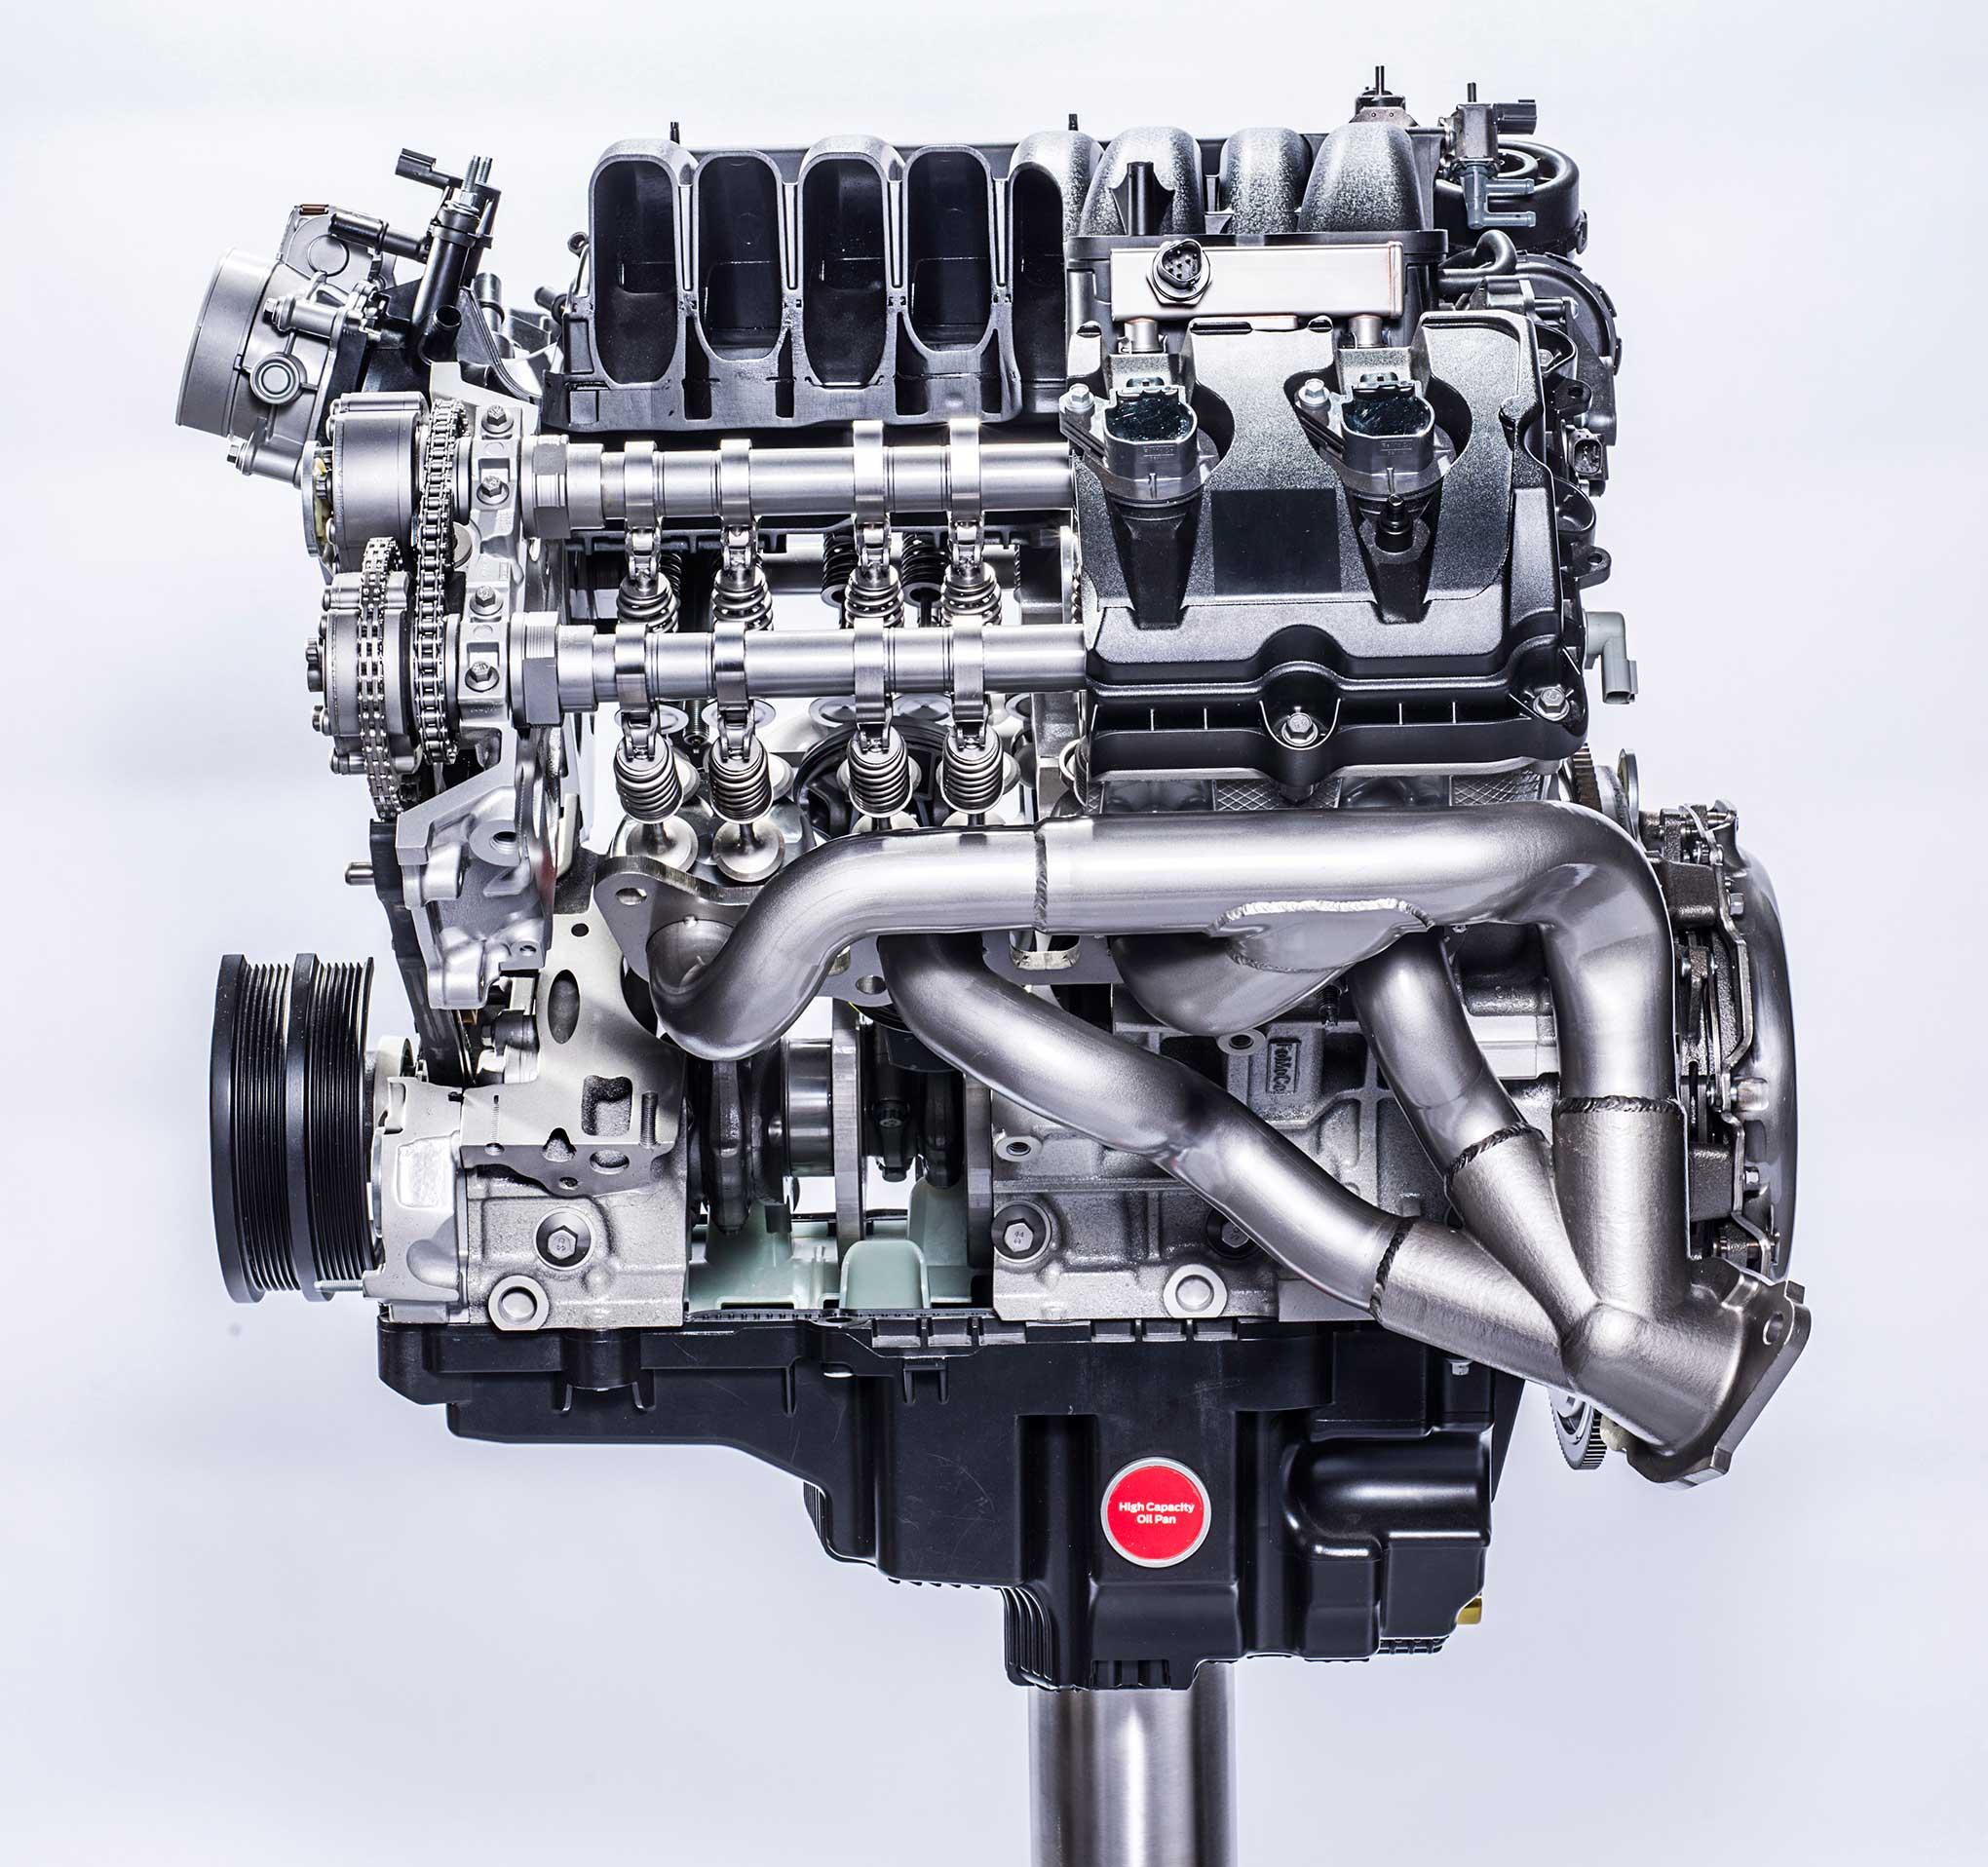 ford-mustang-gt350-return-2018-007